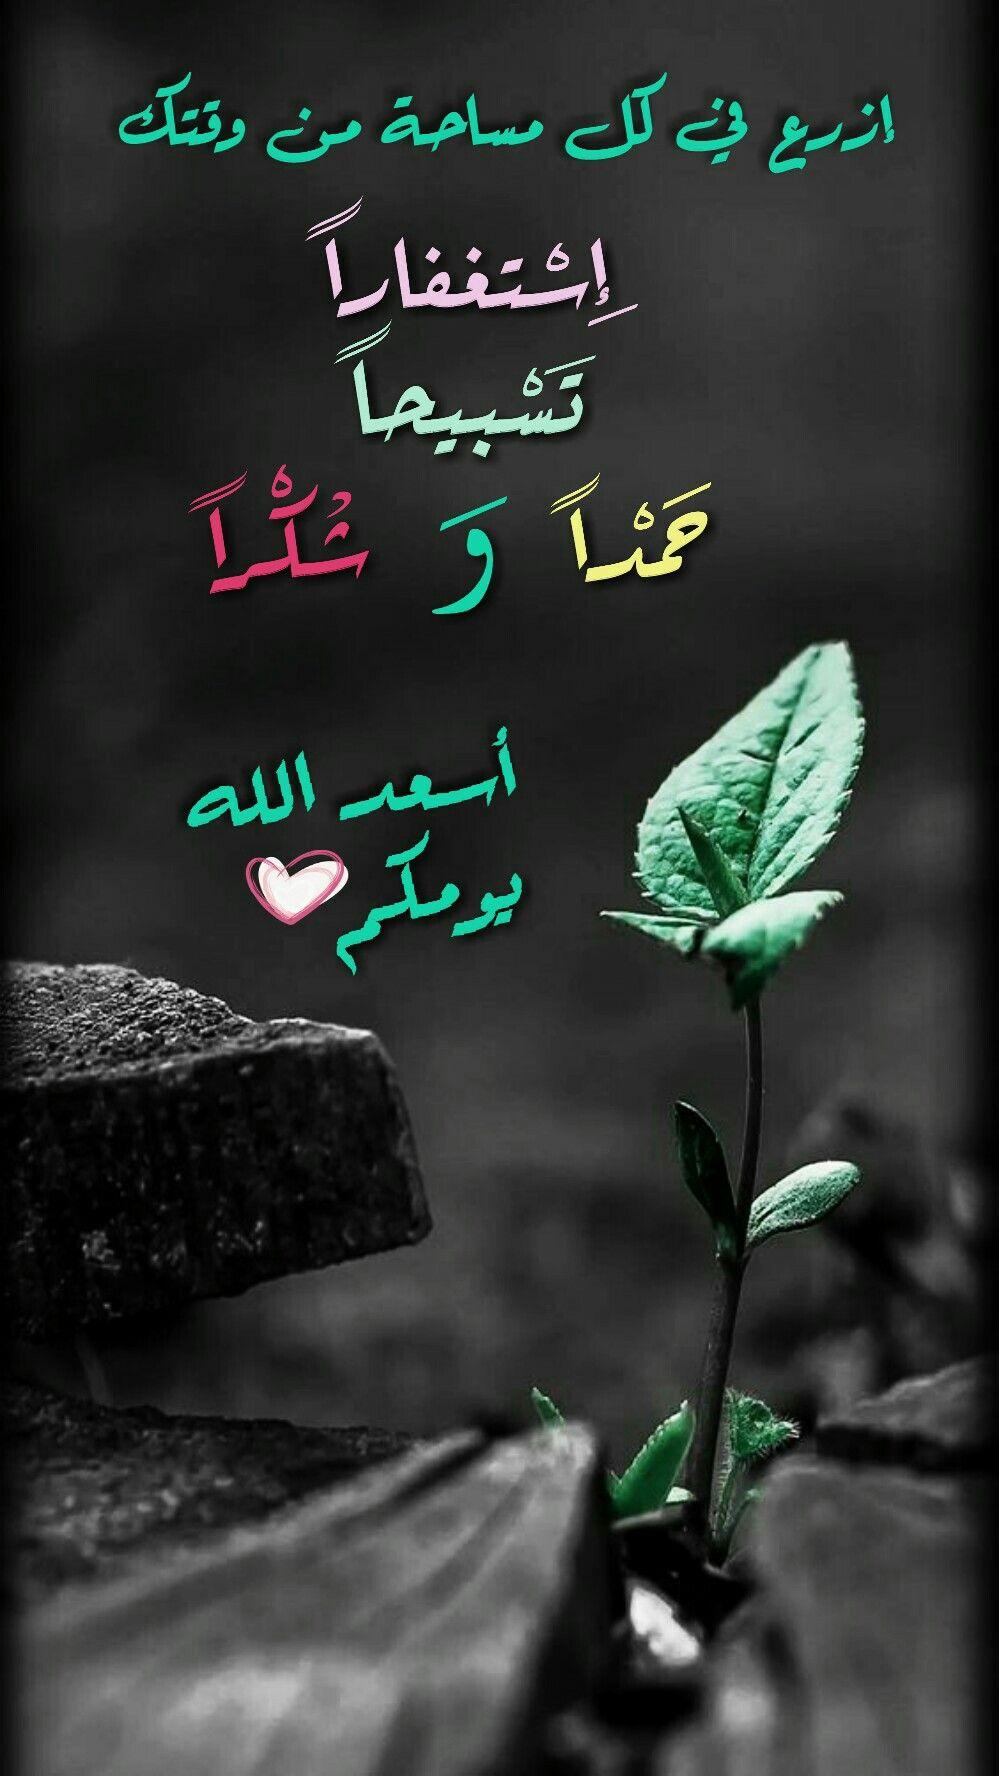 Pin By Ranya Anis On صباحيات و مسائيات Good Morning Images Islamic Quotes Wallpaper Quran Wallpaper